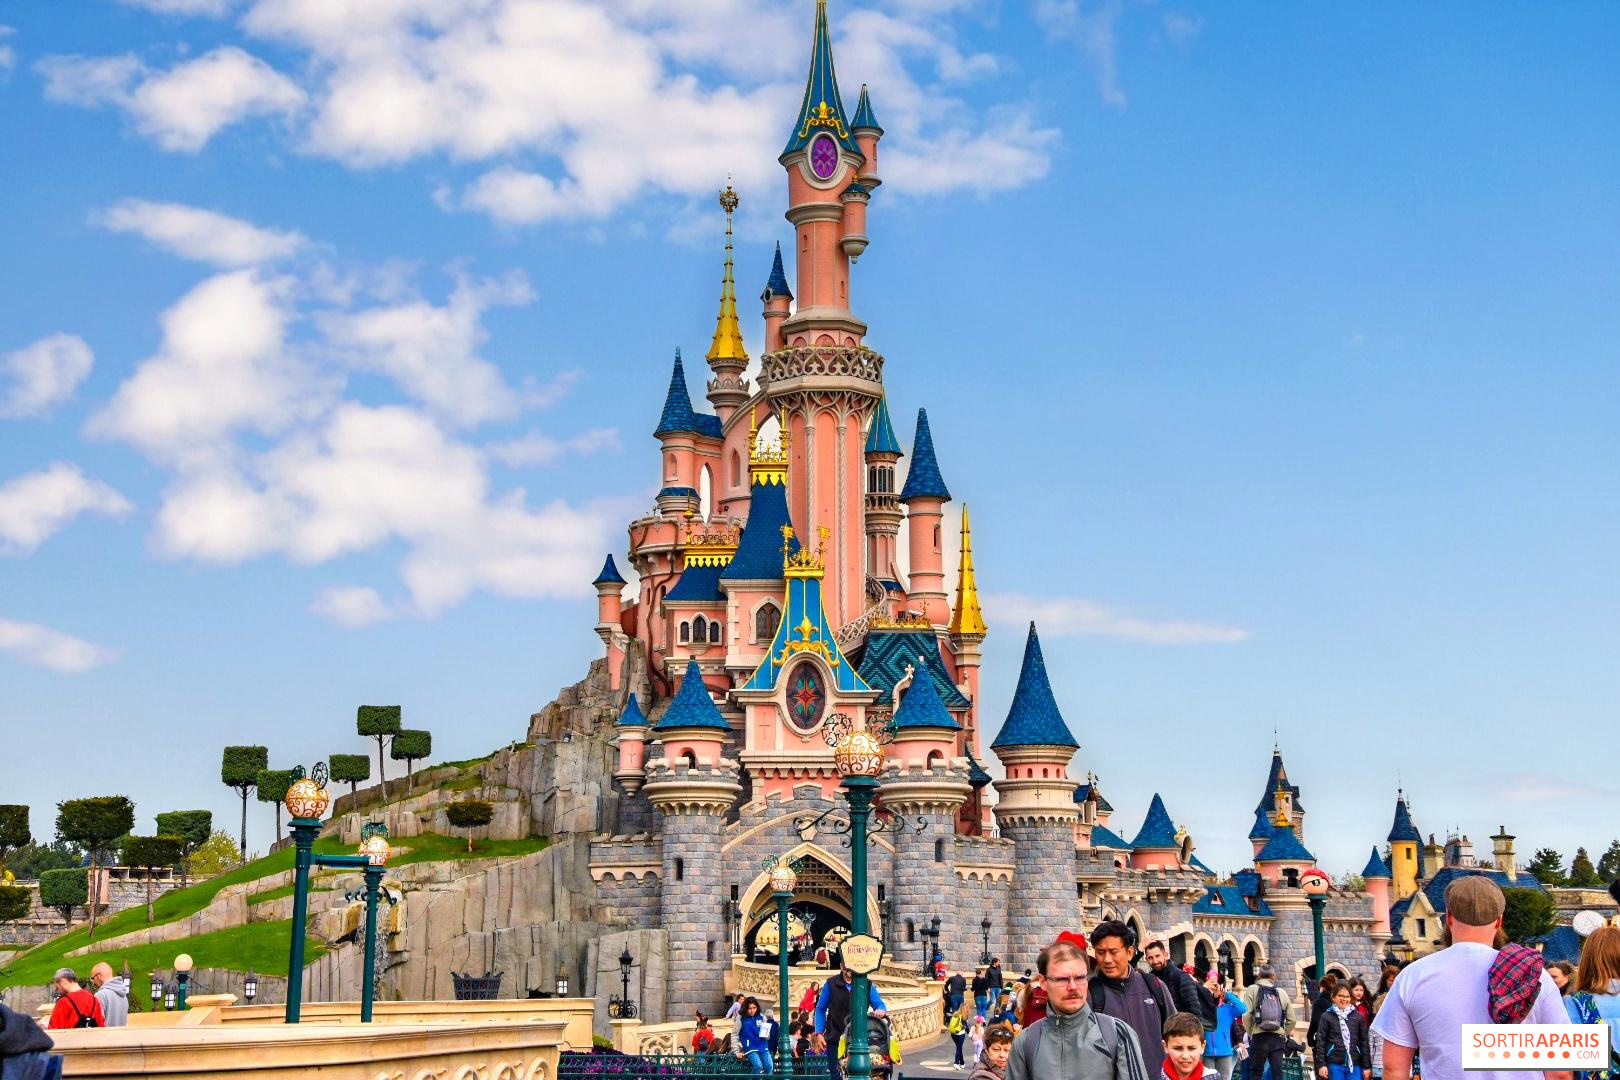 S-a redeschis Disneyland Paris!